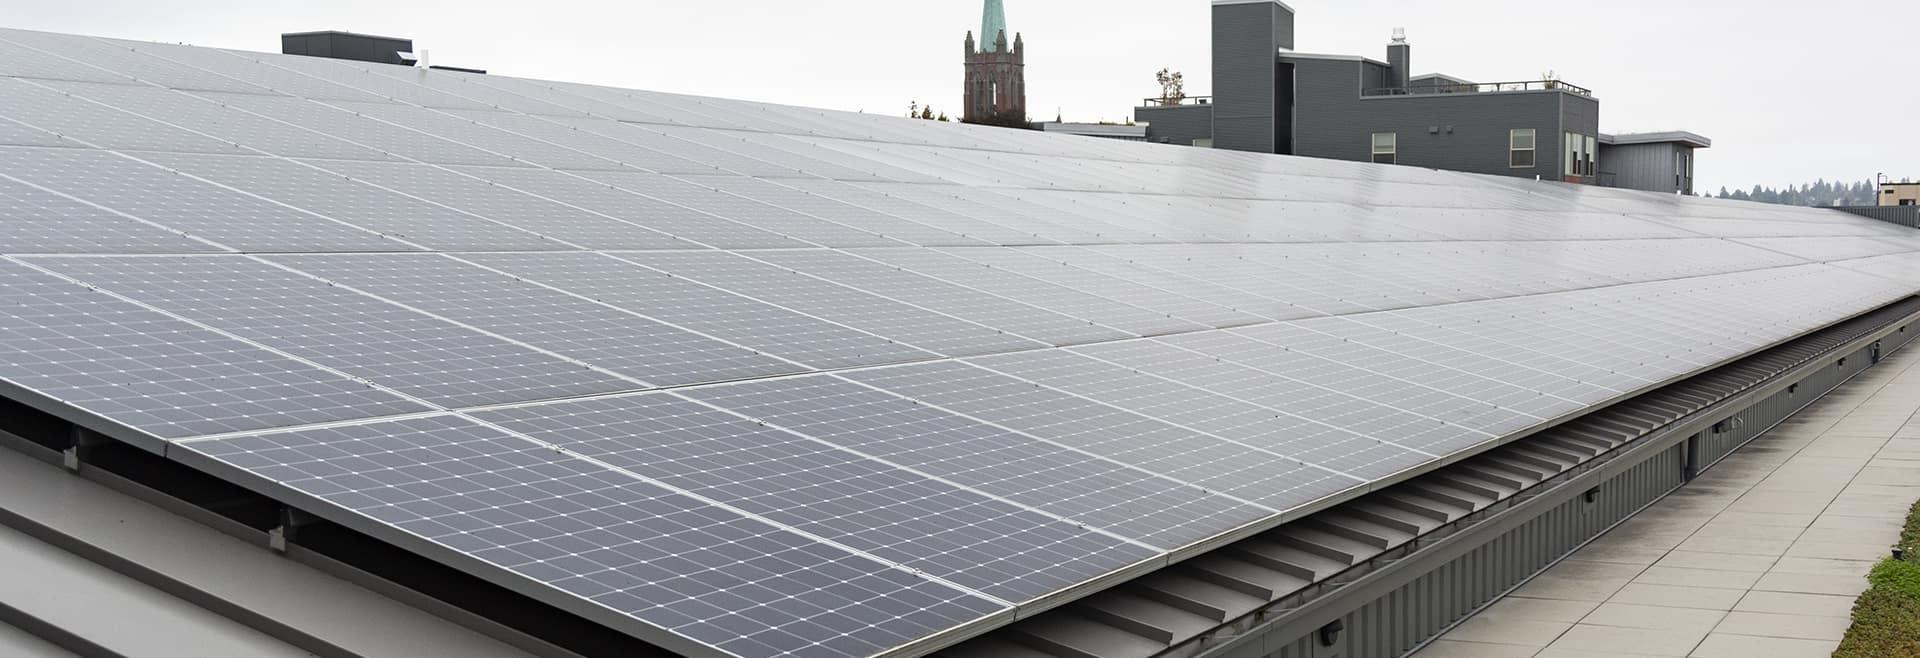 VW Solar Panels Header